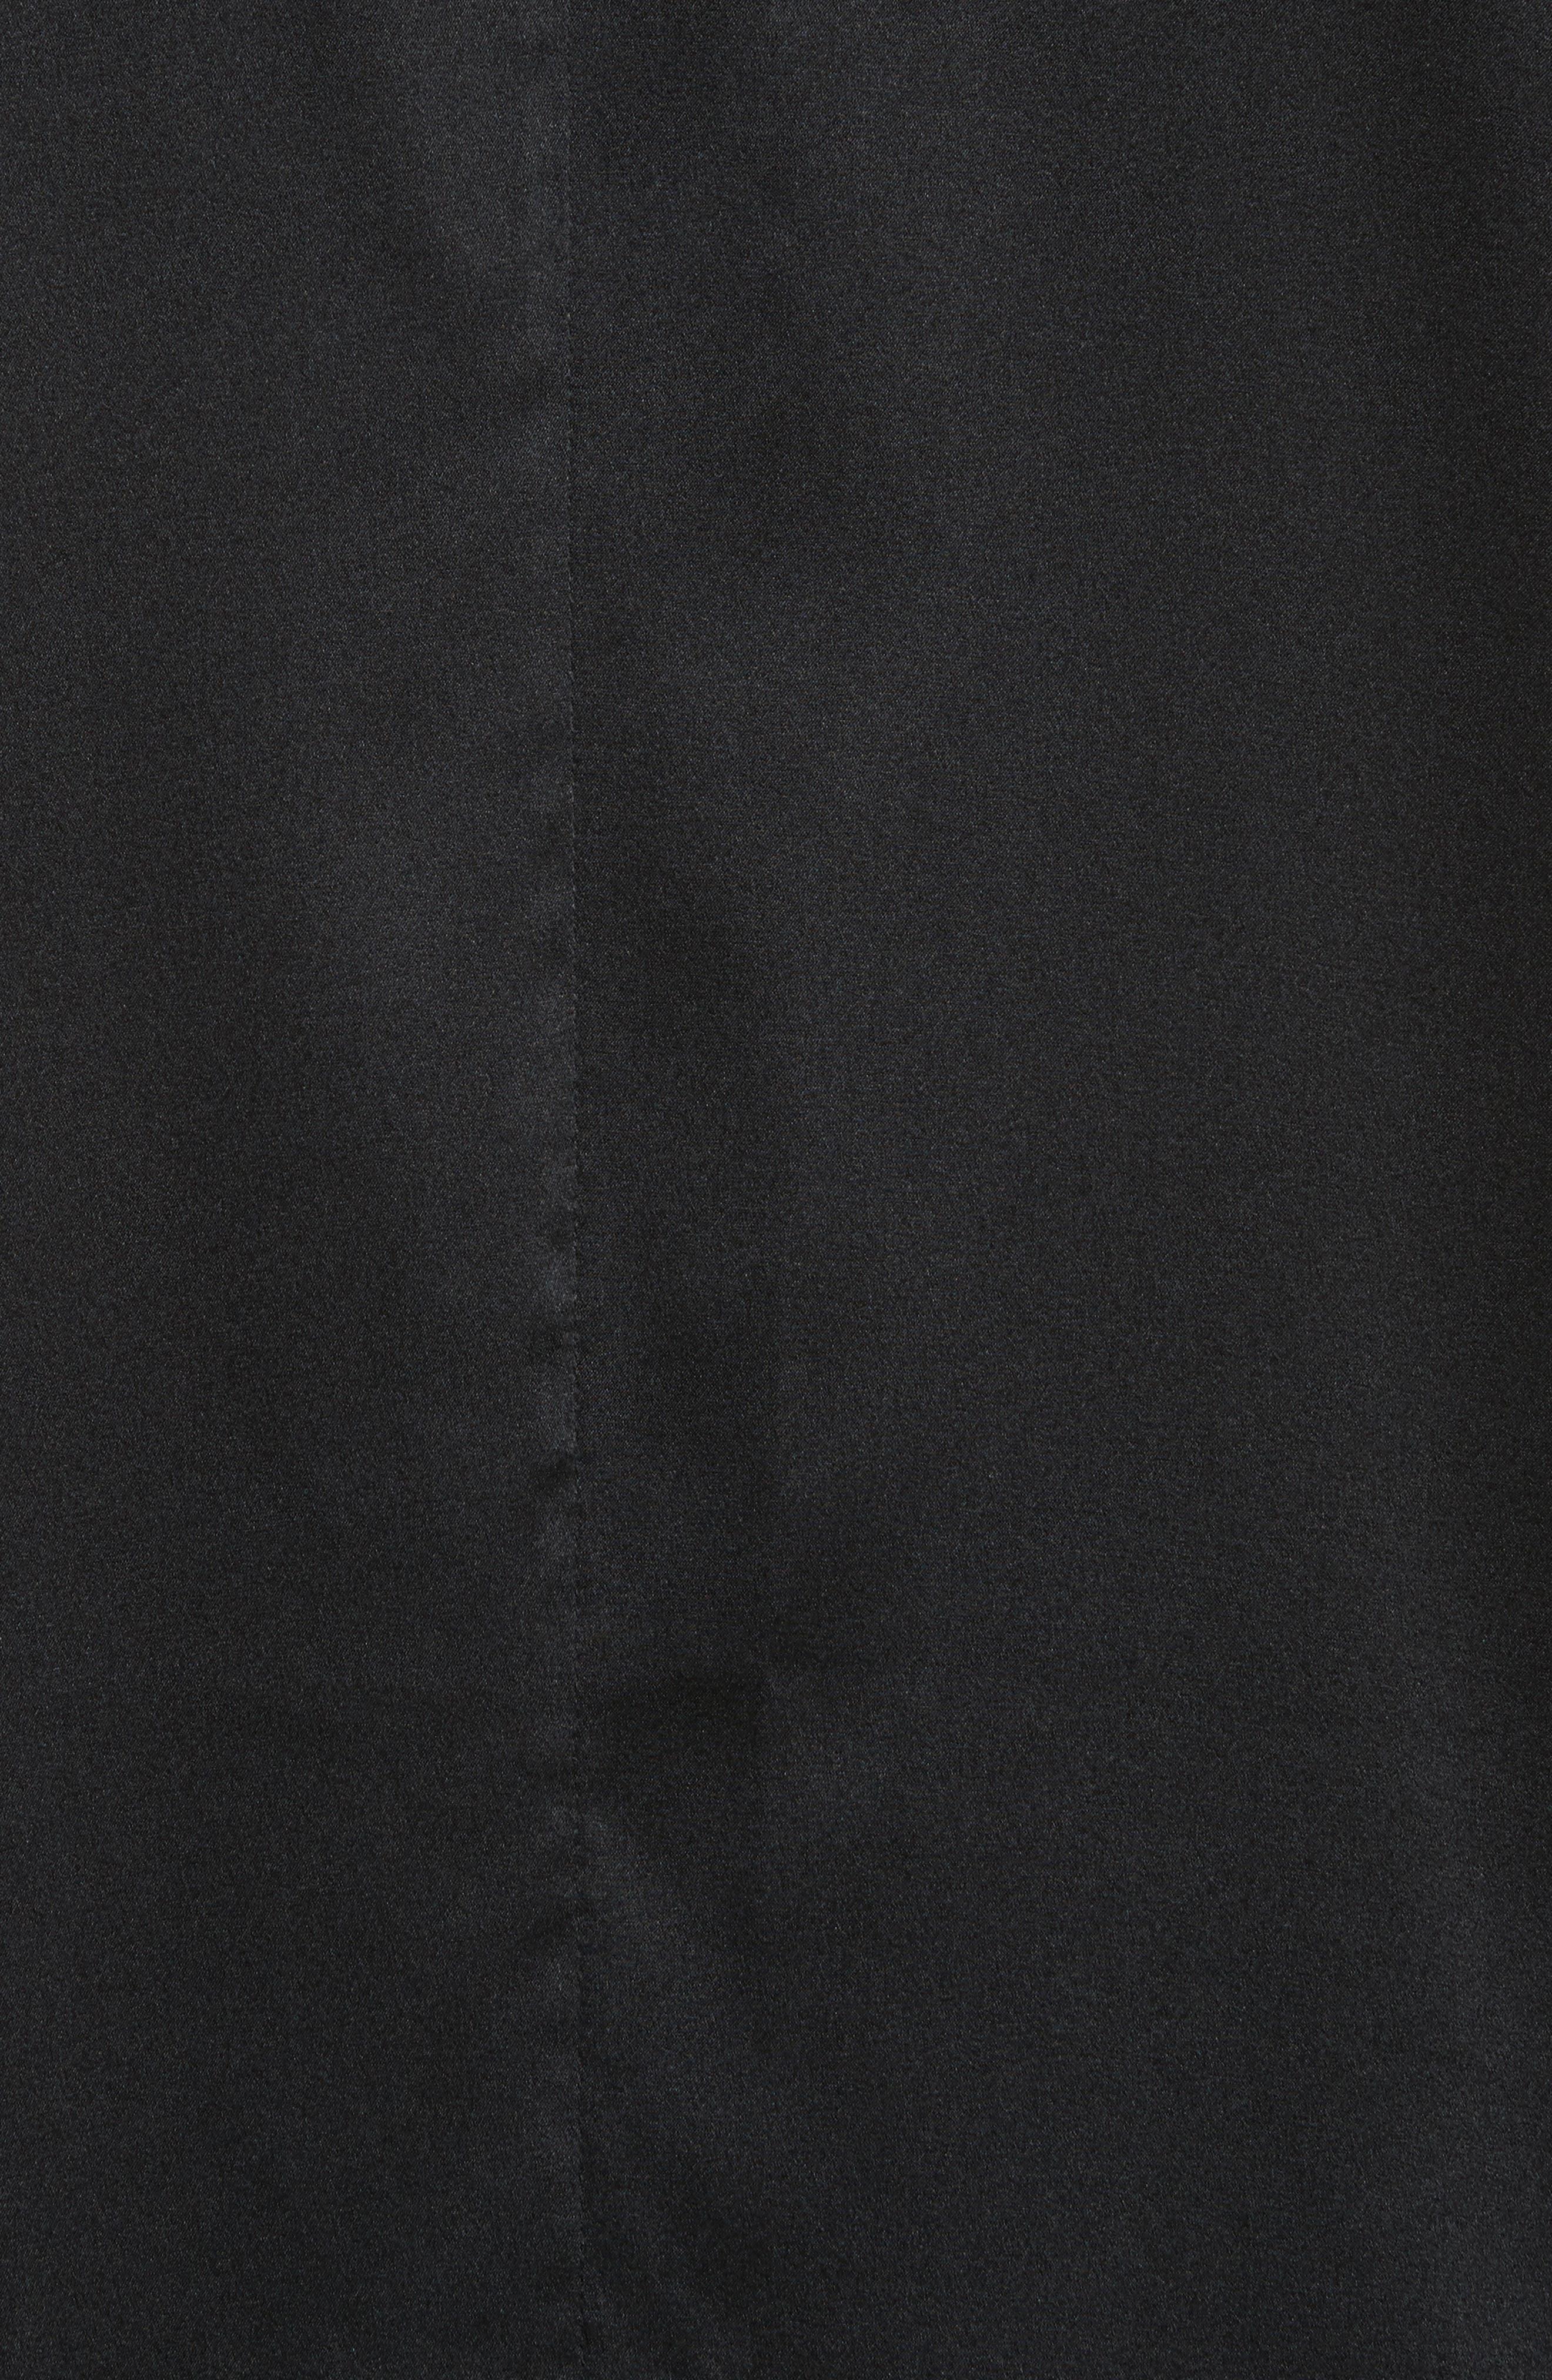 Bow Print Silk Blend Dress,                             Alternate thumbnail 5, color,                             001